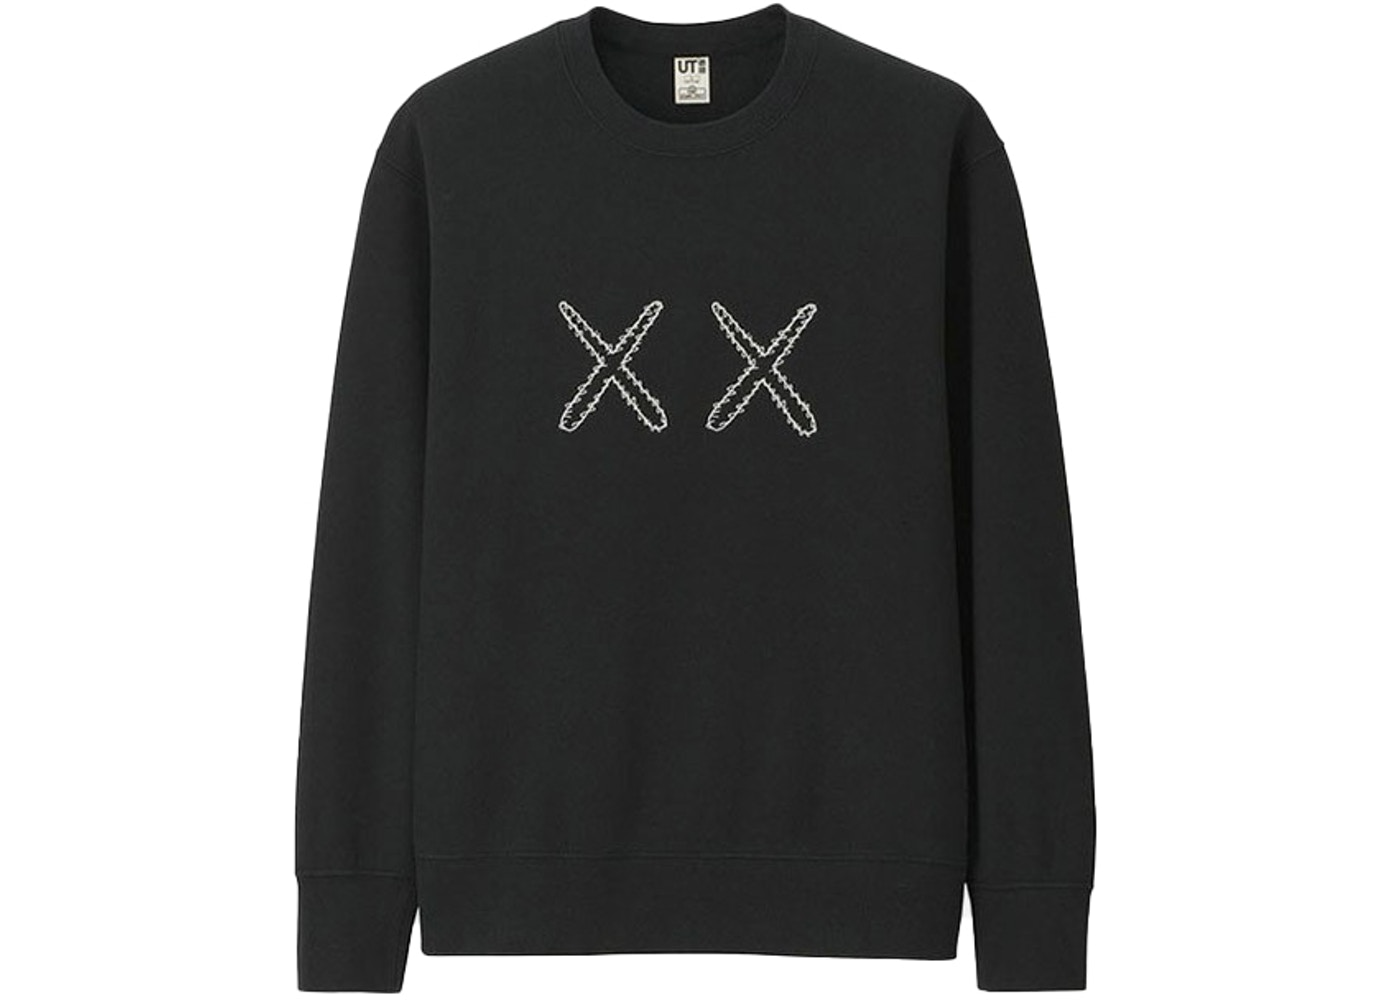 great discount amazing price vast selection KAWS x Uniqlo x Sesame Street XX Sweatshirt Black